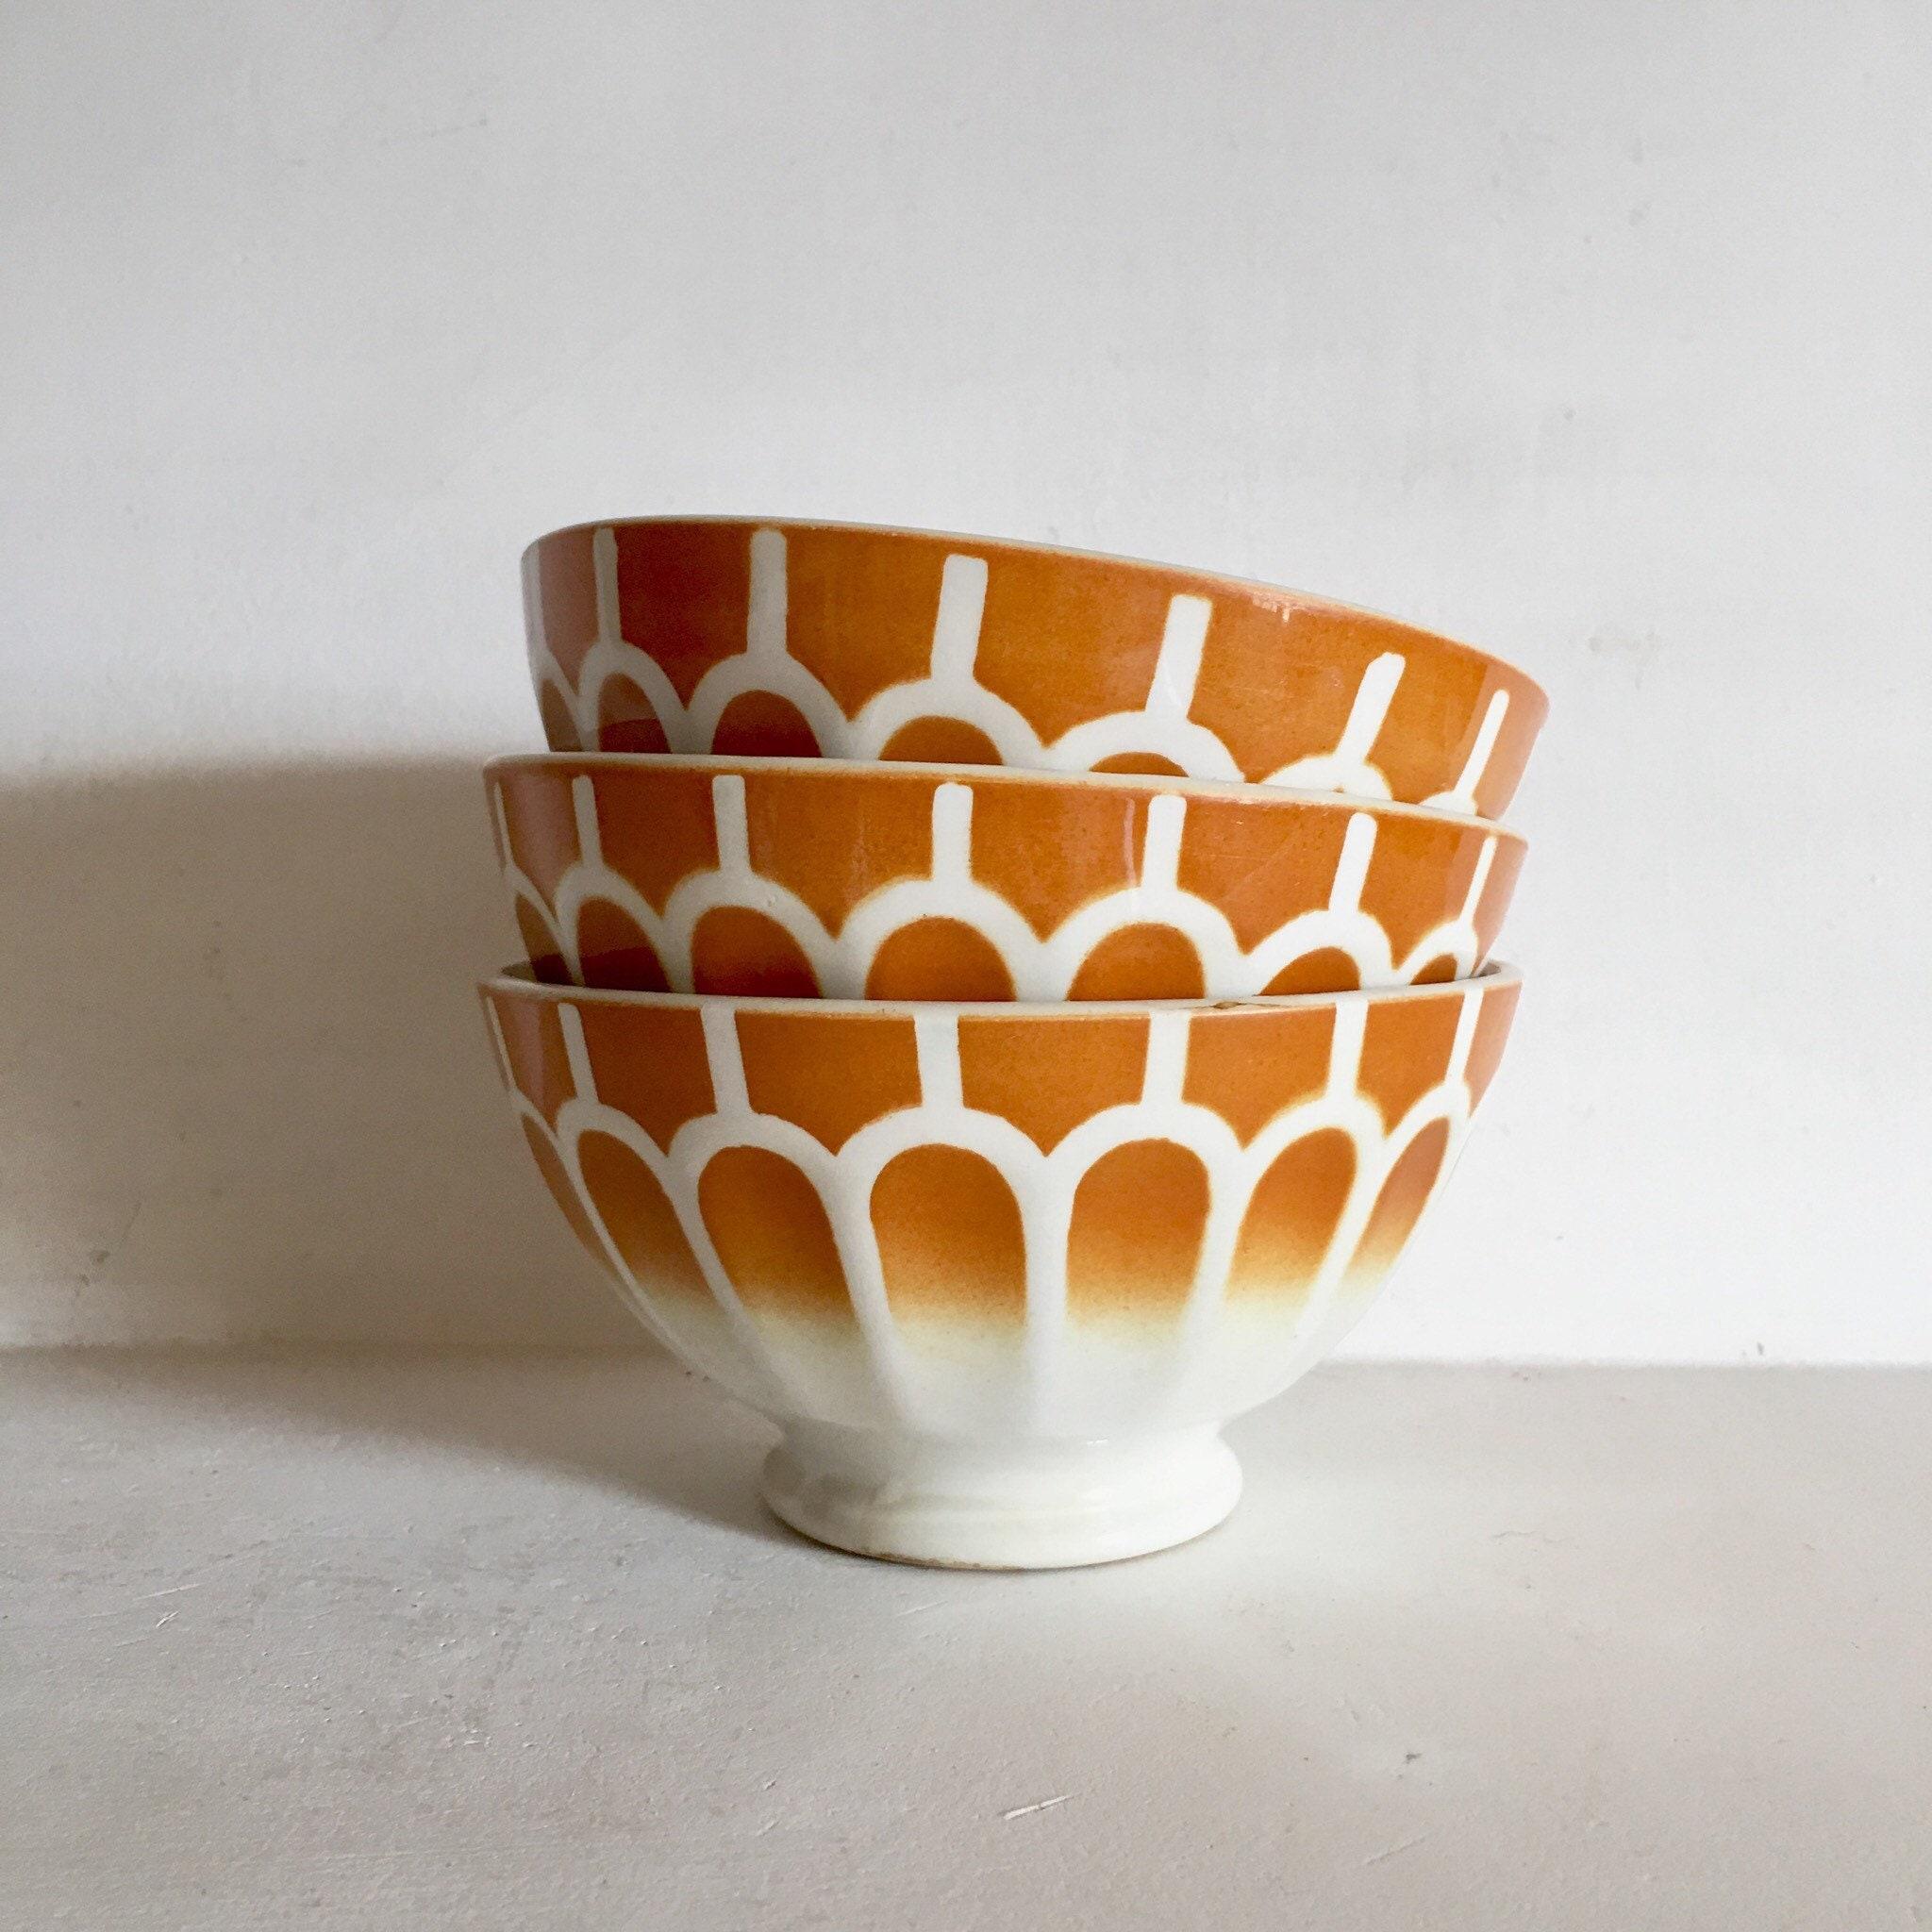 French Antique Coffee Bowls Cafe au Lait Bowls Set of 3   Etsy